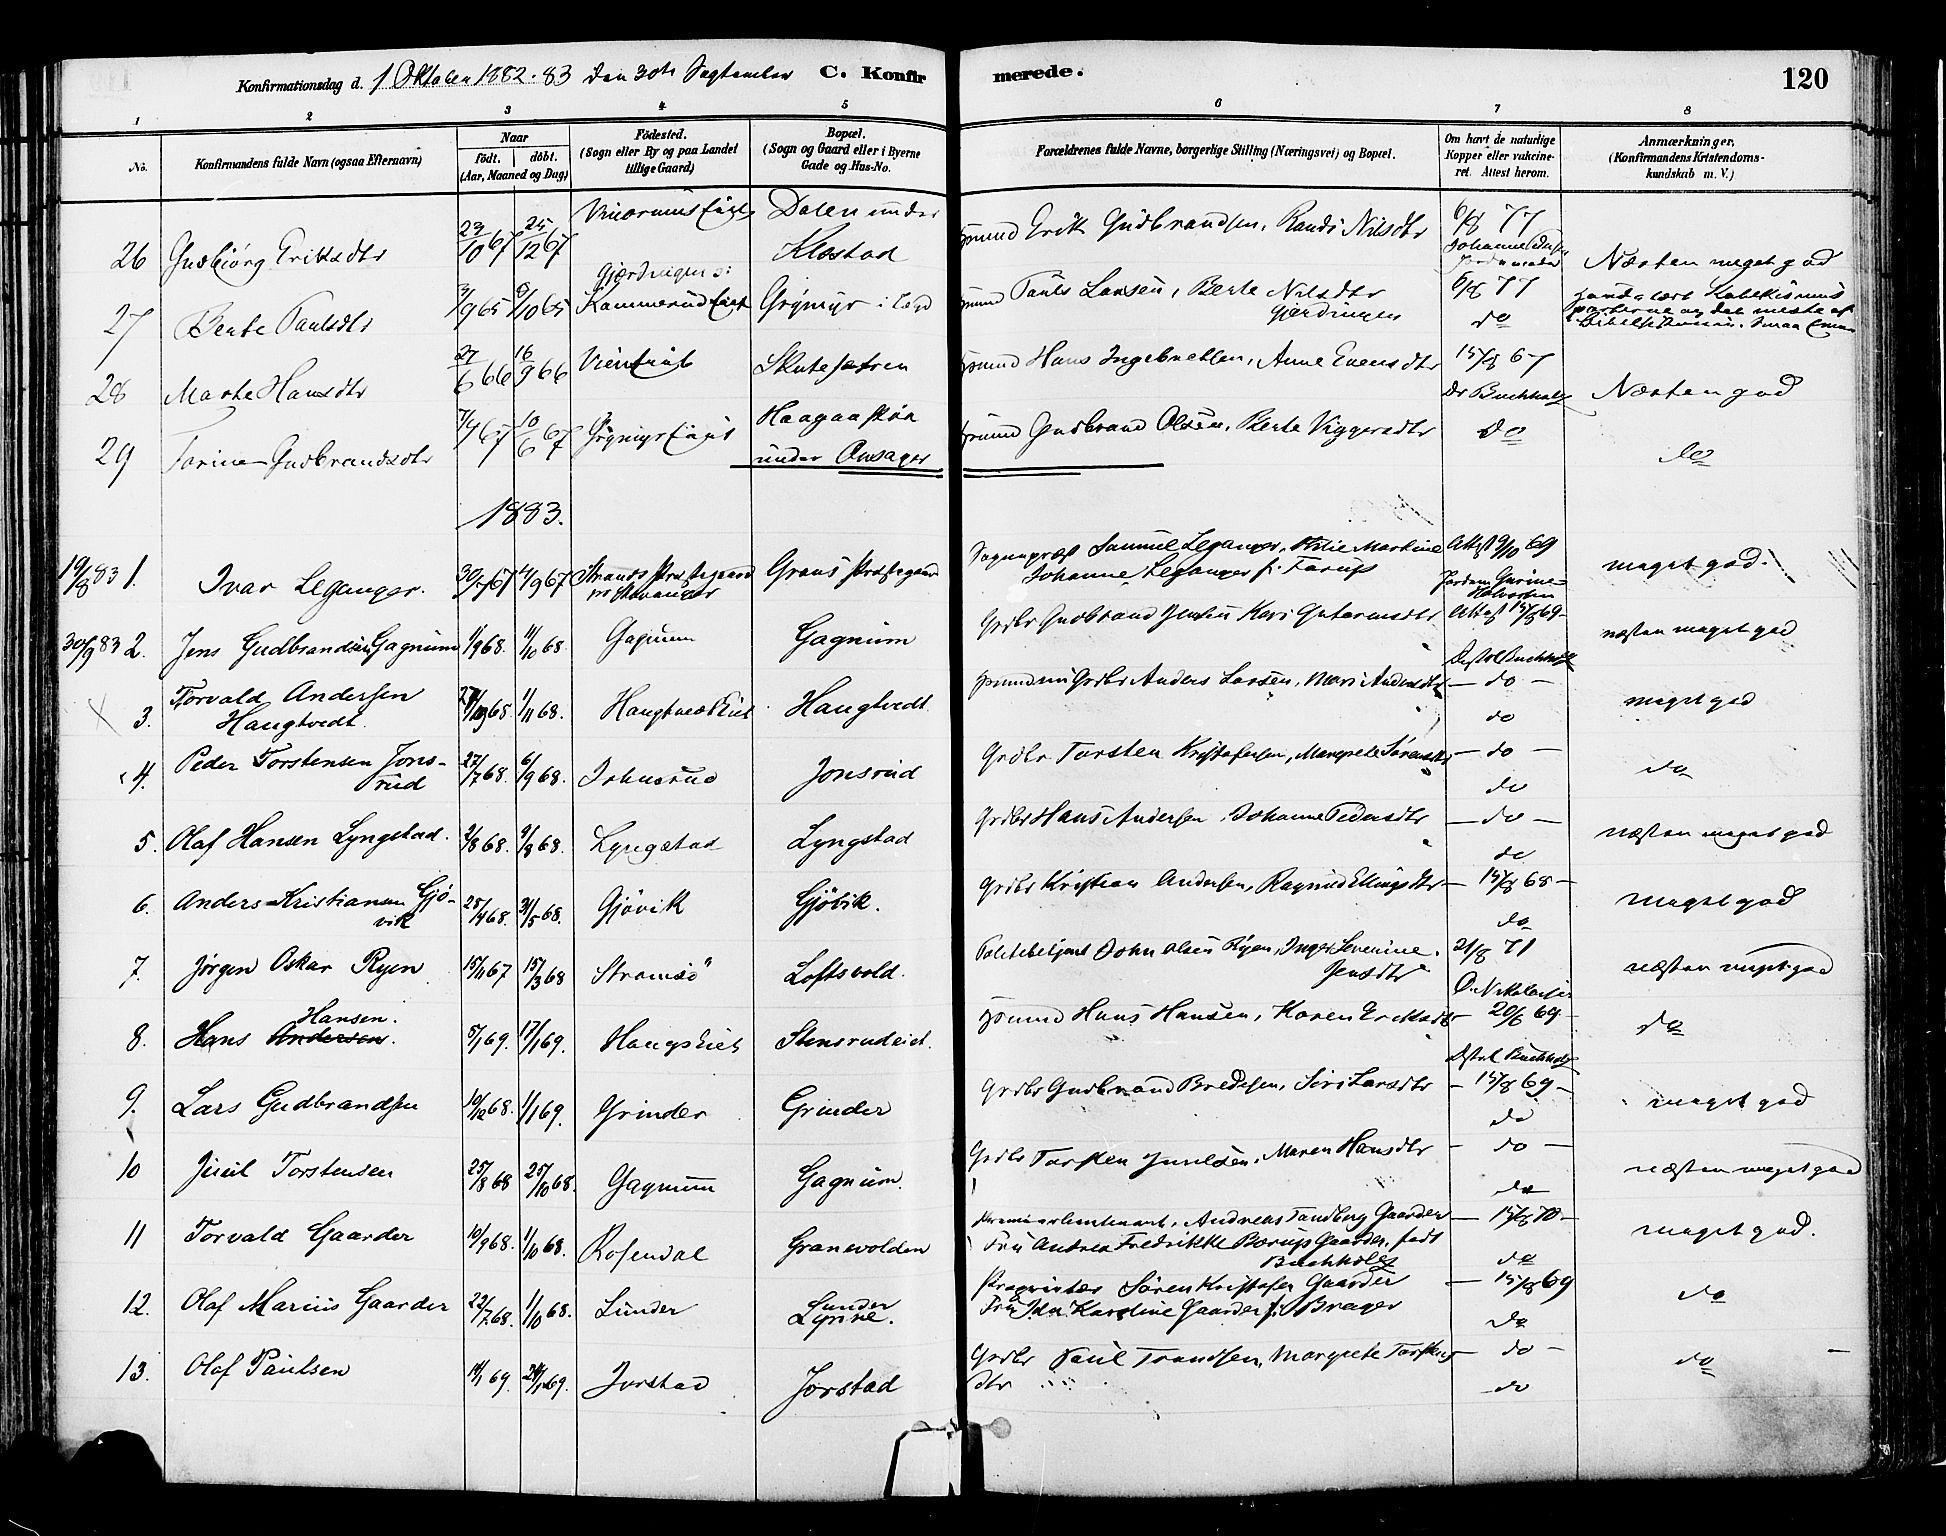 SAH, Gran prestekontor, Ministerialbok nr. 14, 1880-1889, s. 120